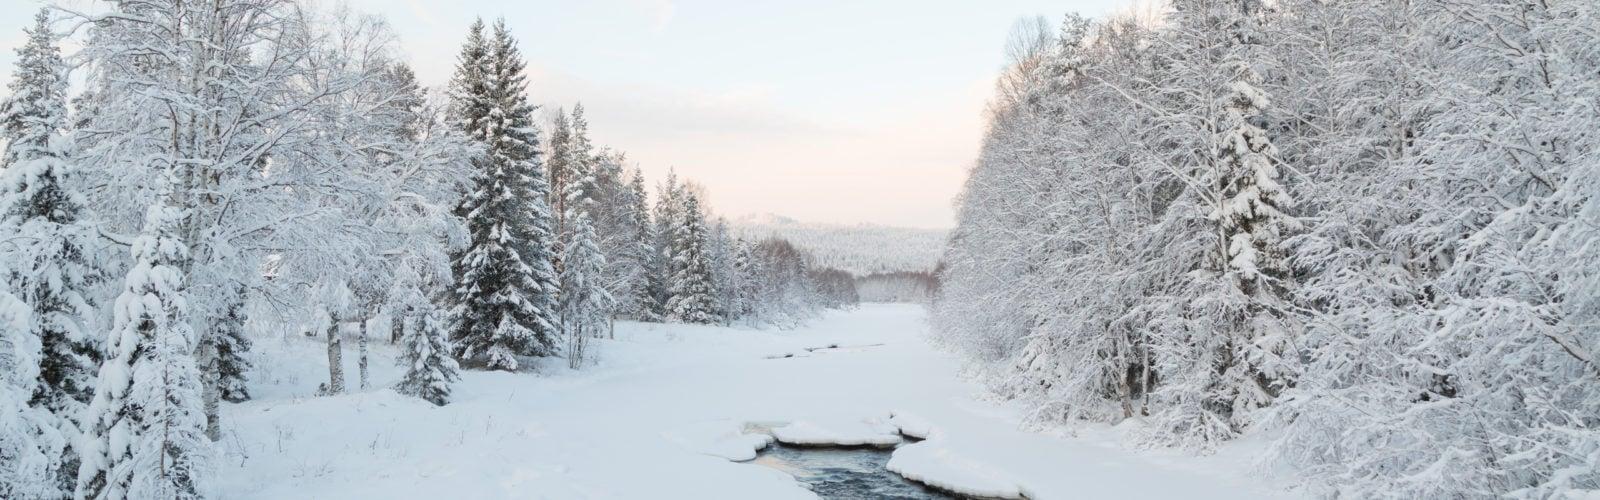 loggers-lodge-winter-swedish-lapland